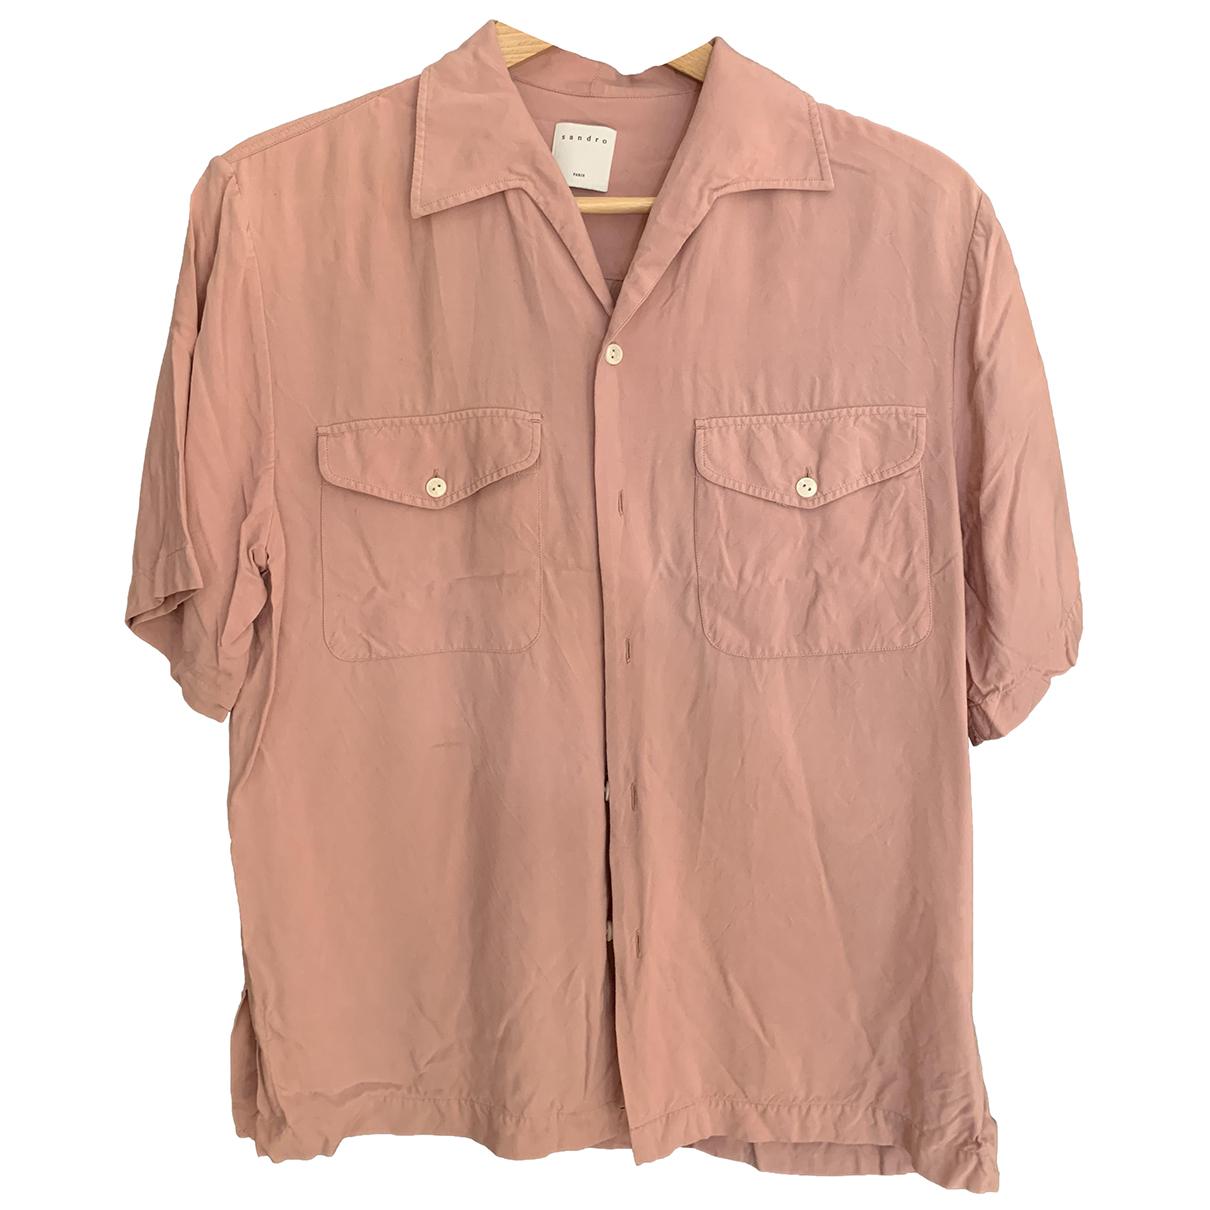 Sandro - Chemises Spring Summer 2019 pour homme en cuir - rose